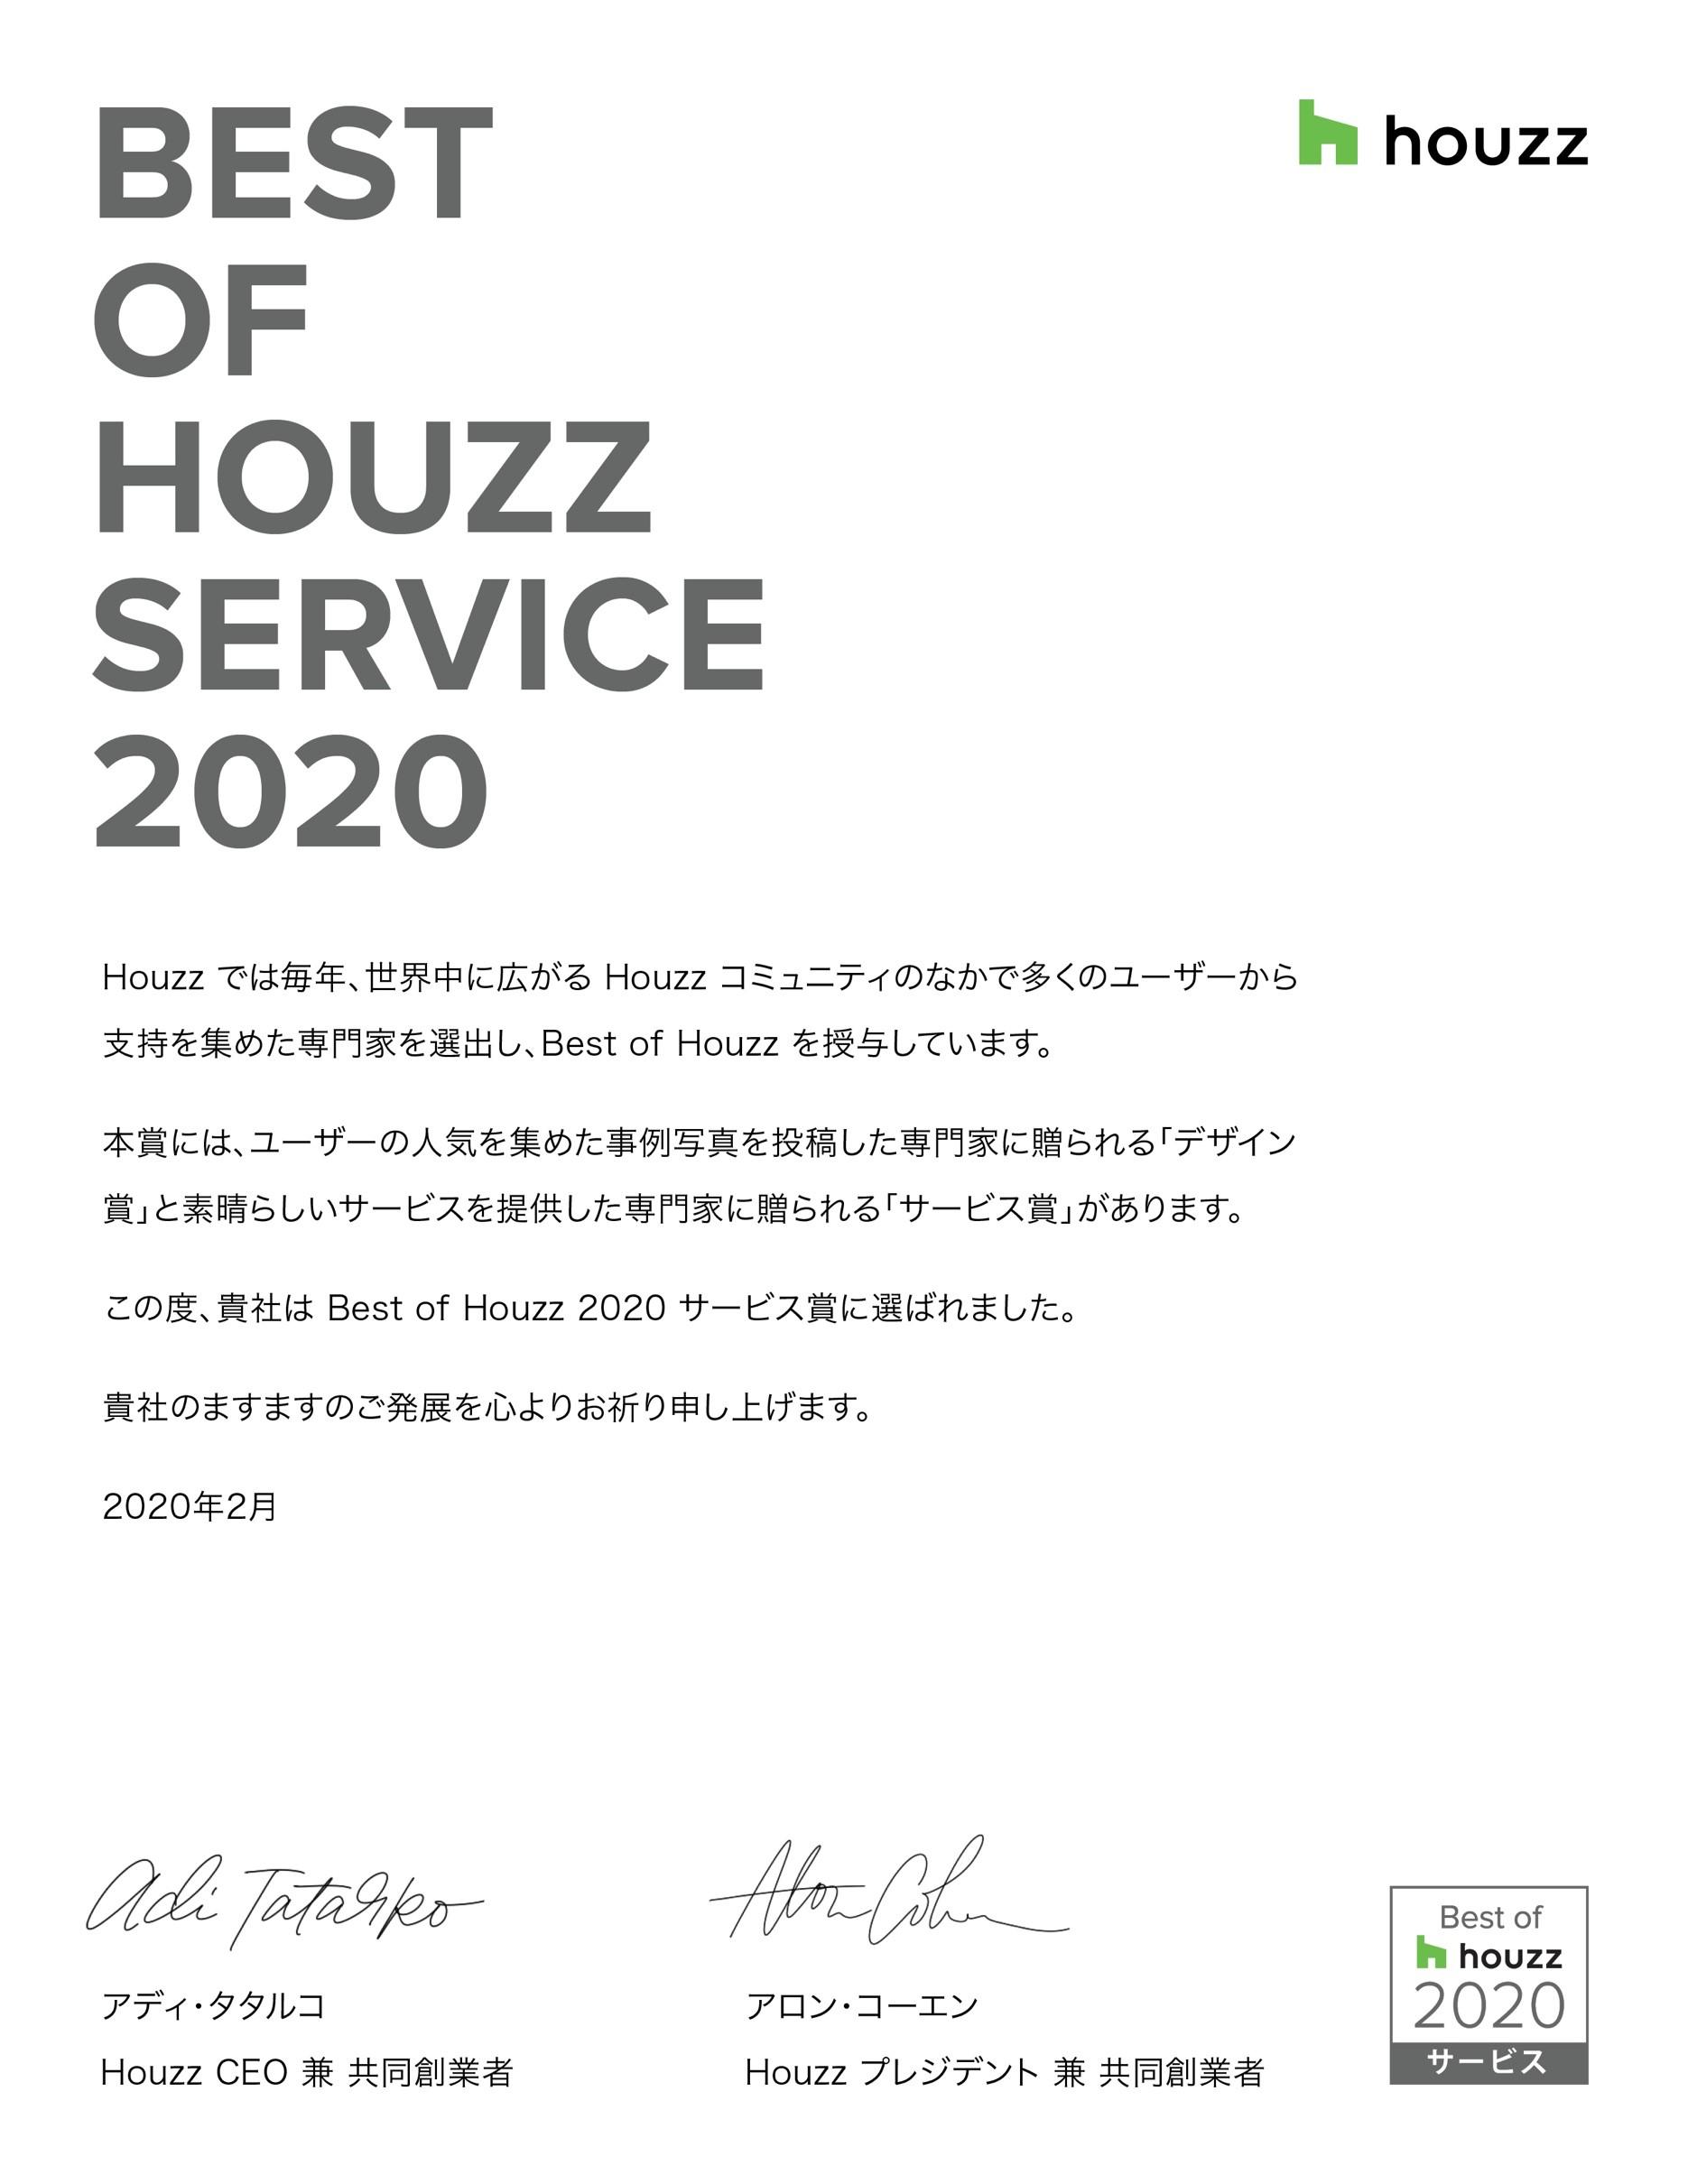 Houzz certificate